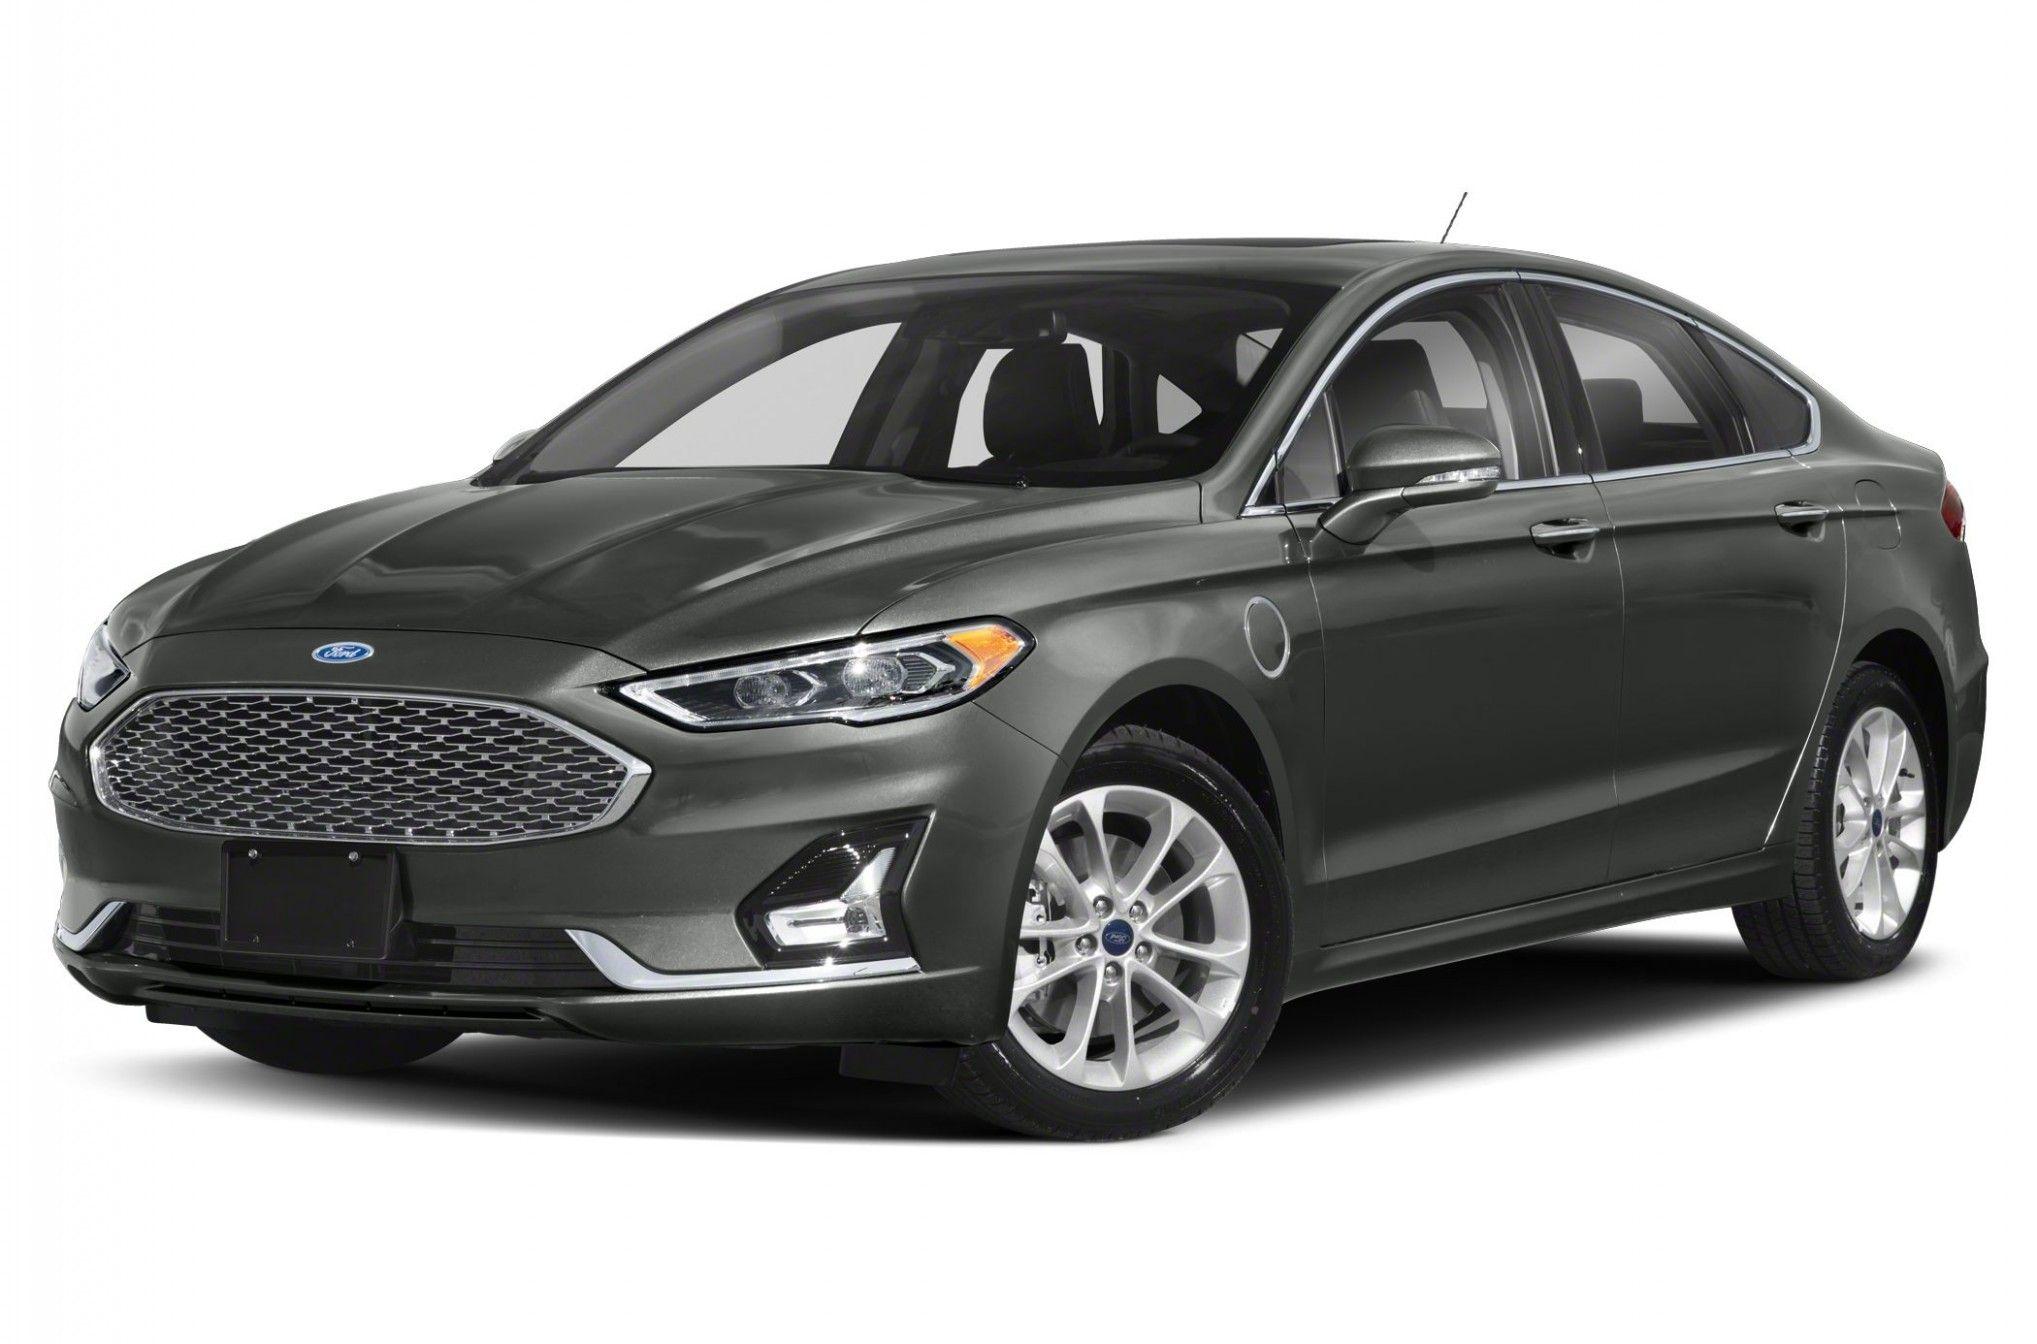 2020 Ford Fusion Energi Performance Ford fusion energi